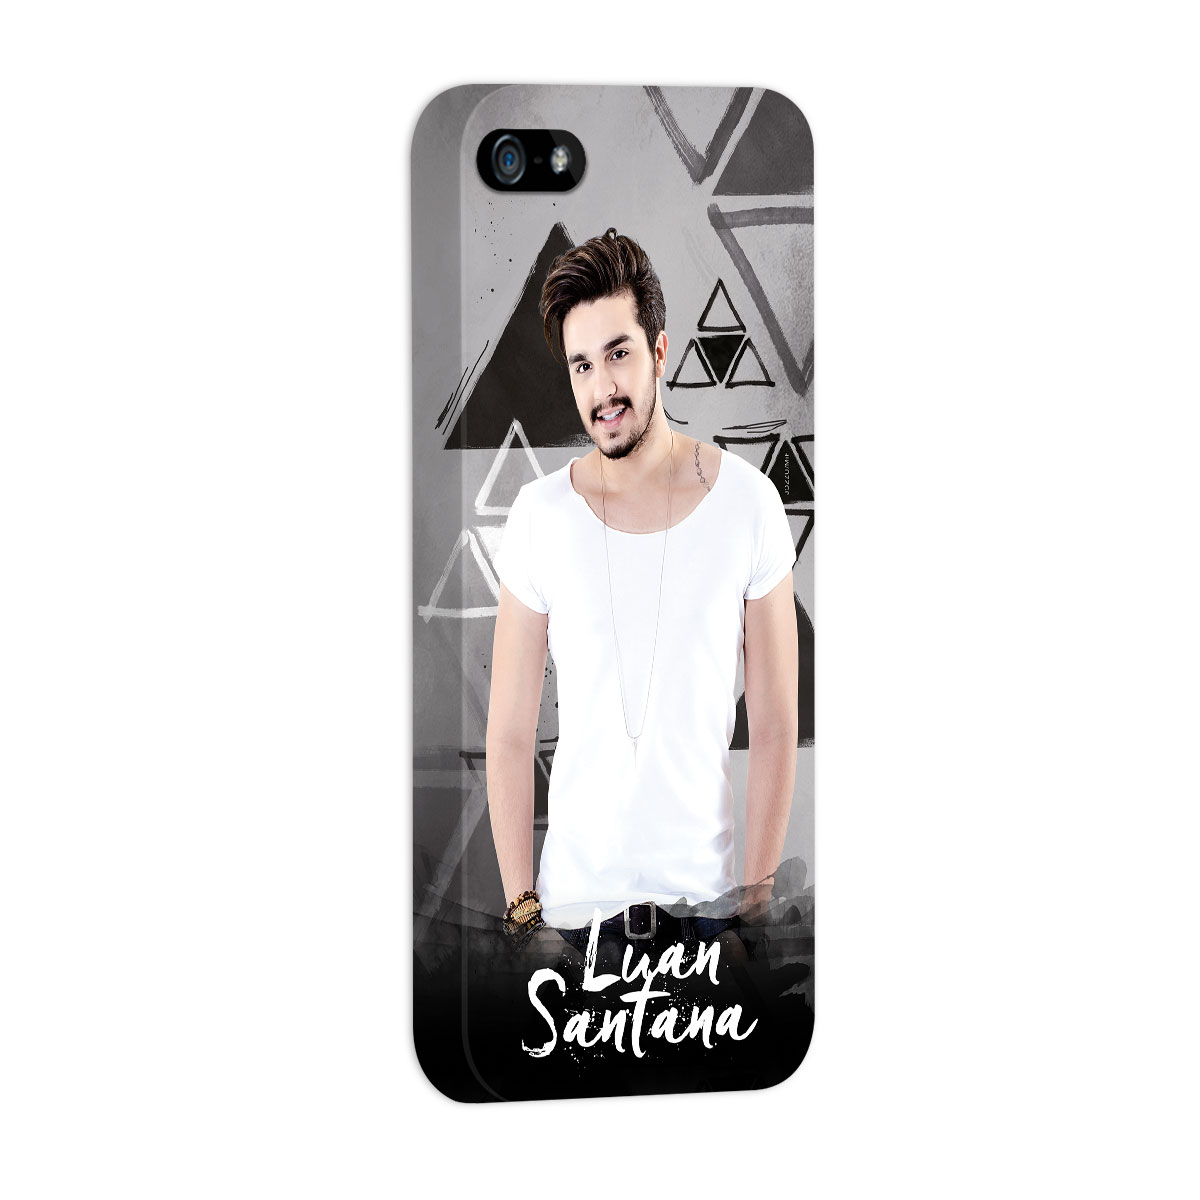 Capa para iPhone 5/5S Luan Santana Picture